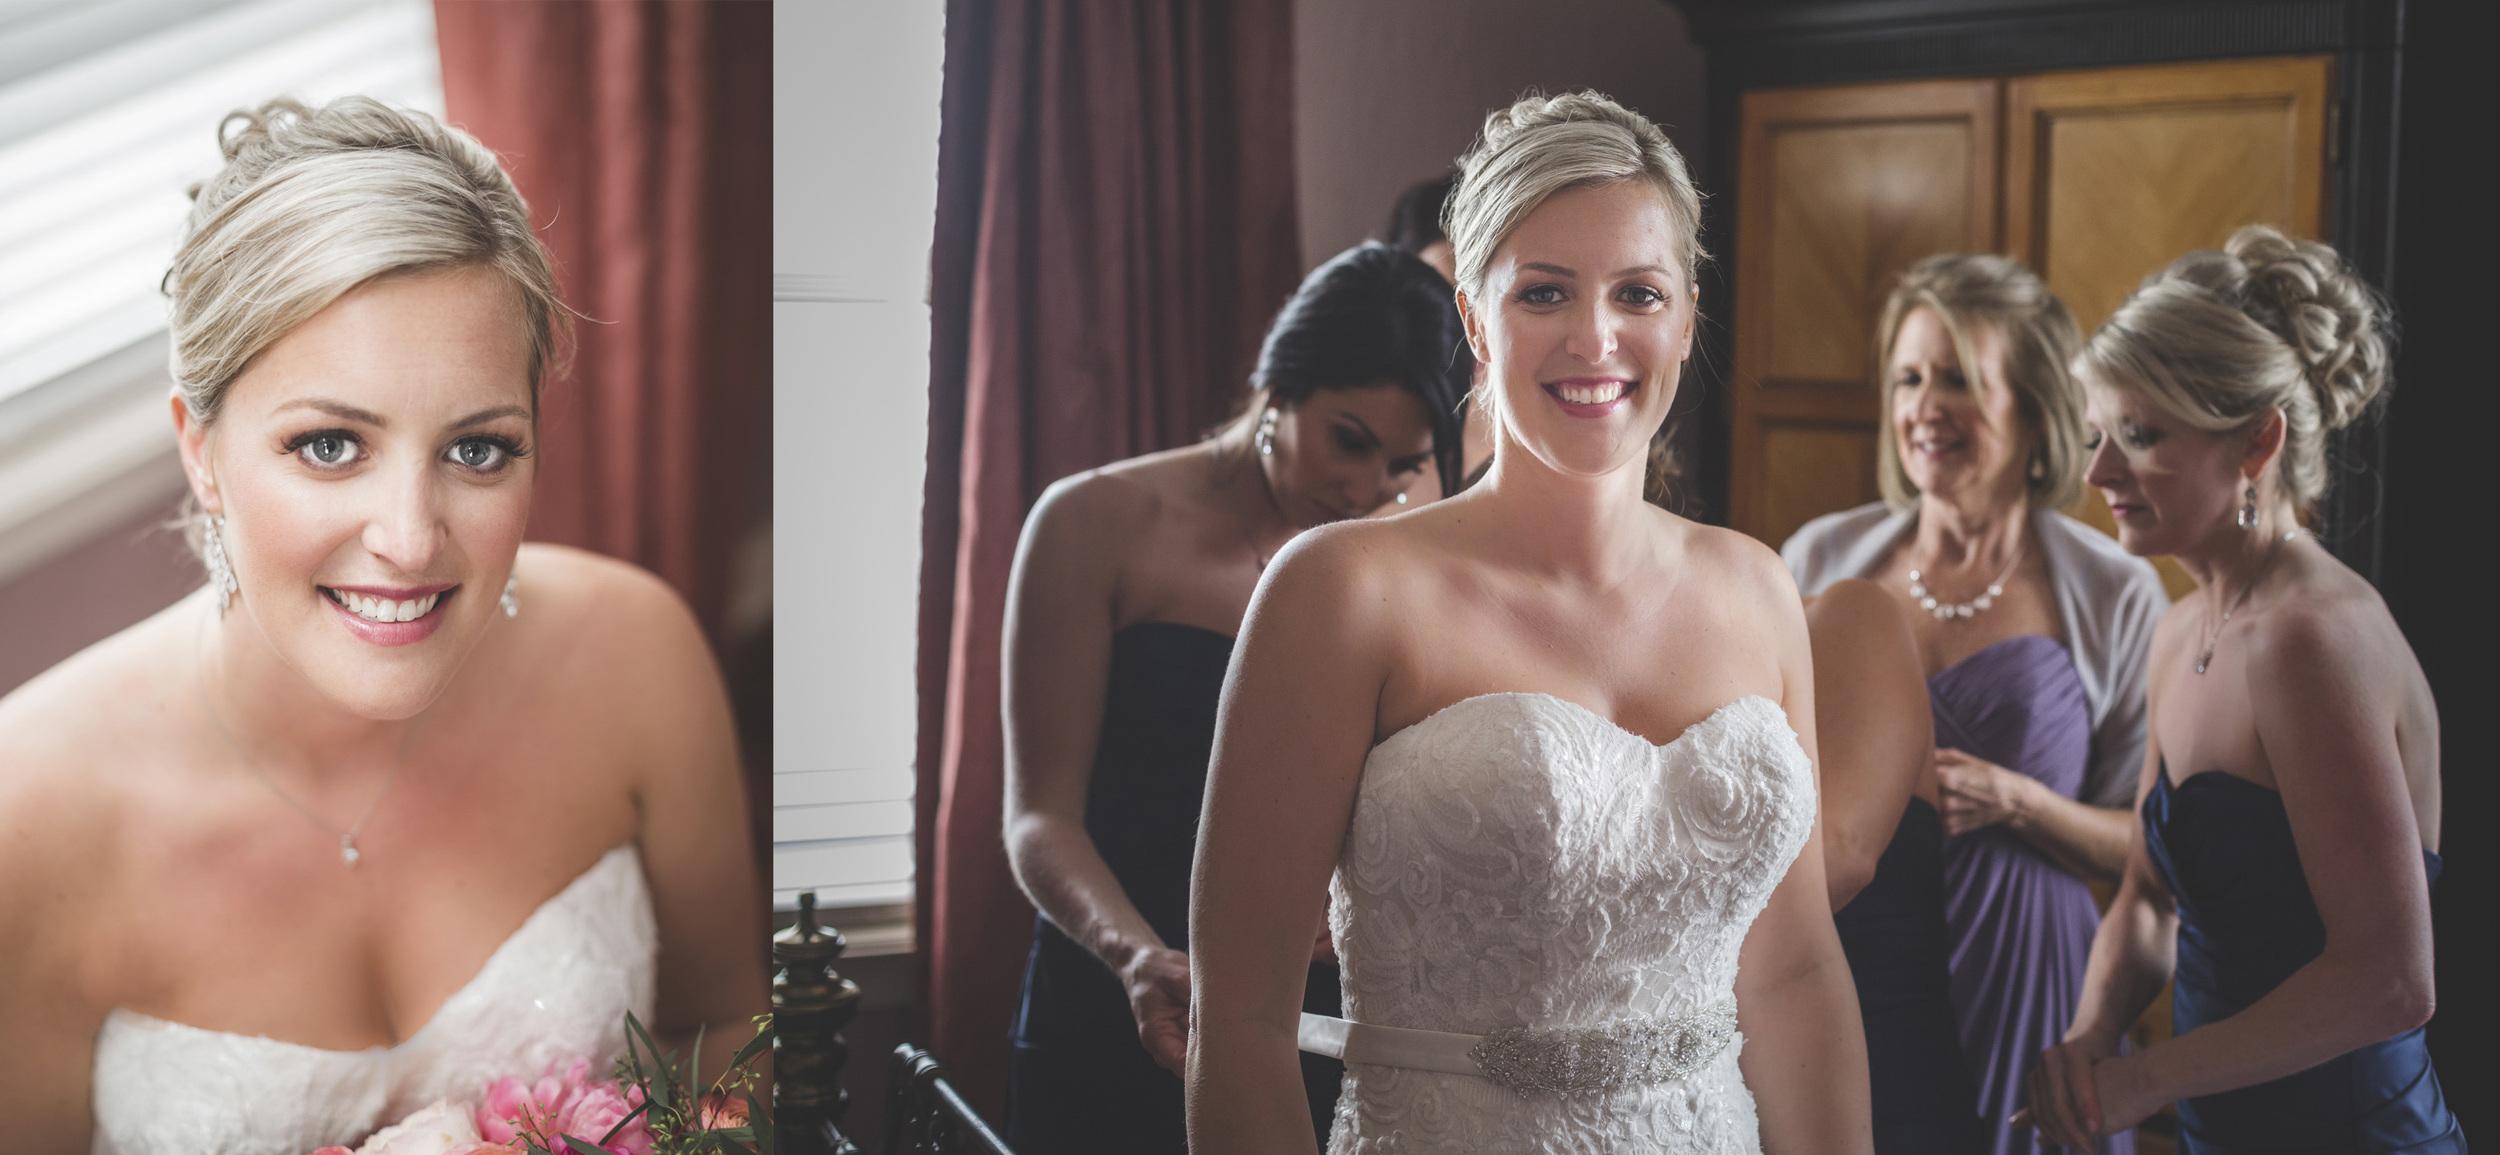 adam-szarmack-casa-marina-wedding-photographer-jacksonville-beach-florida-13.jpg